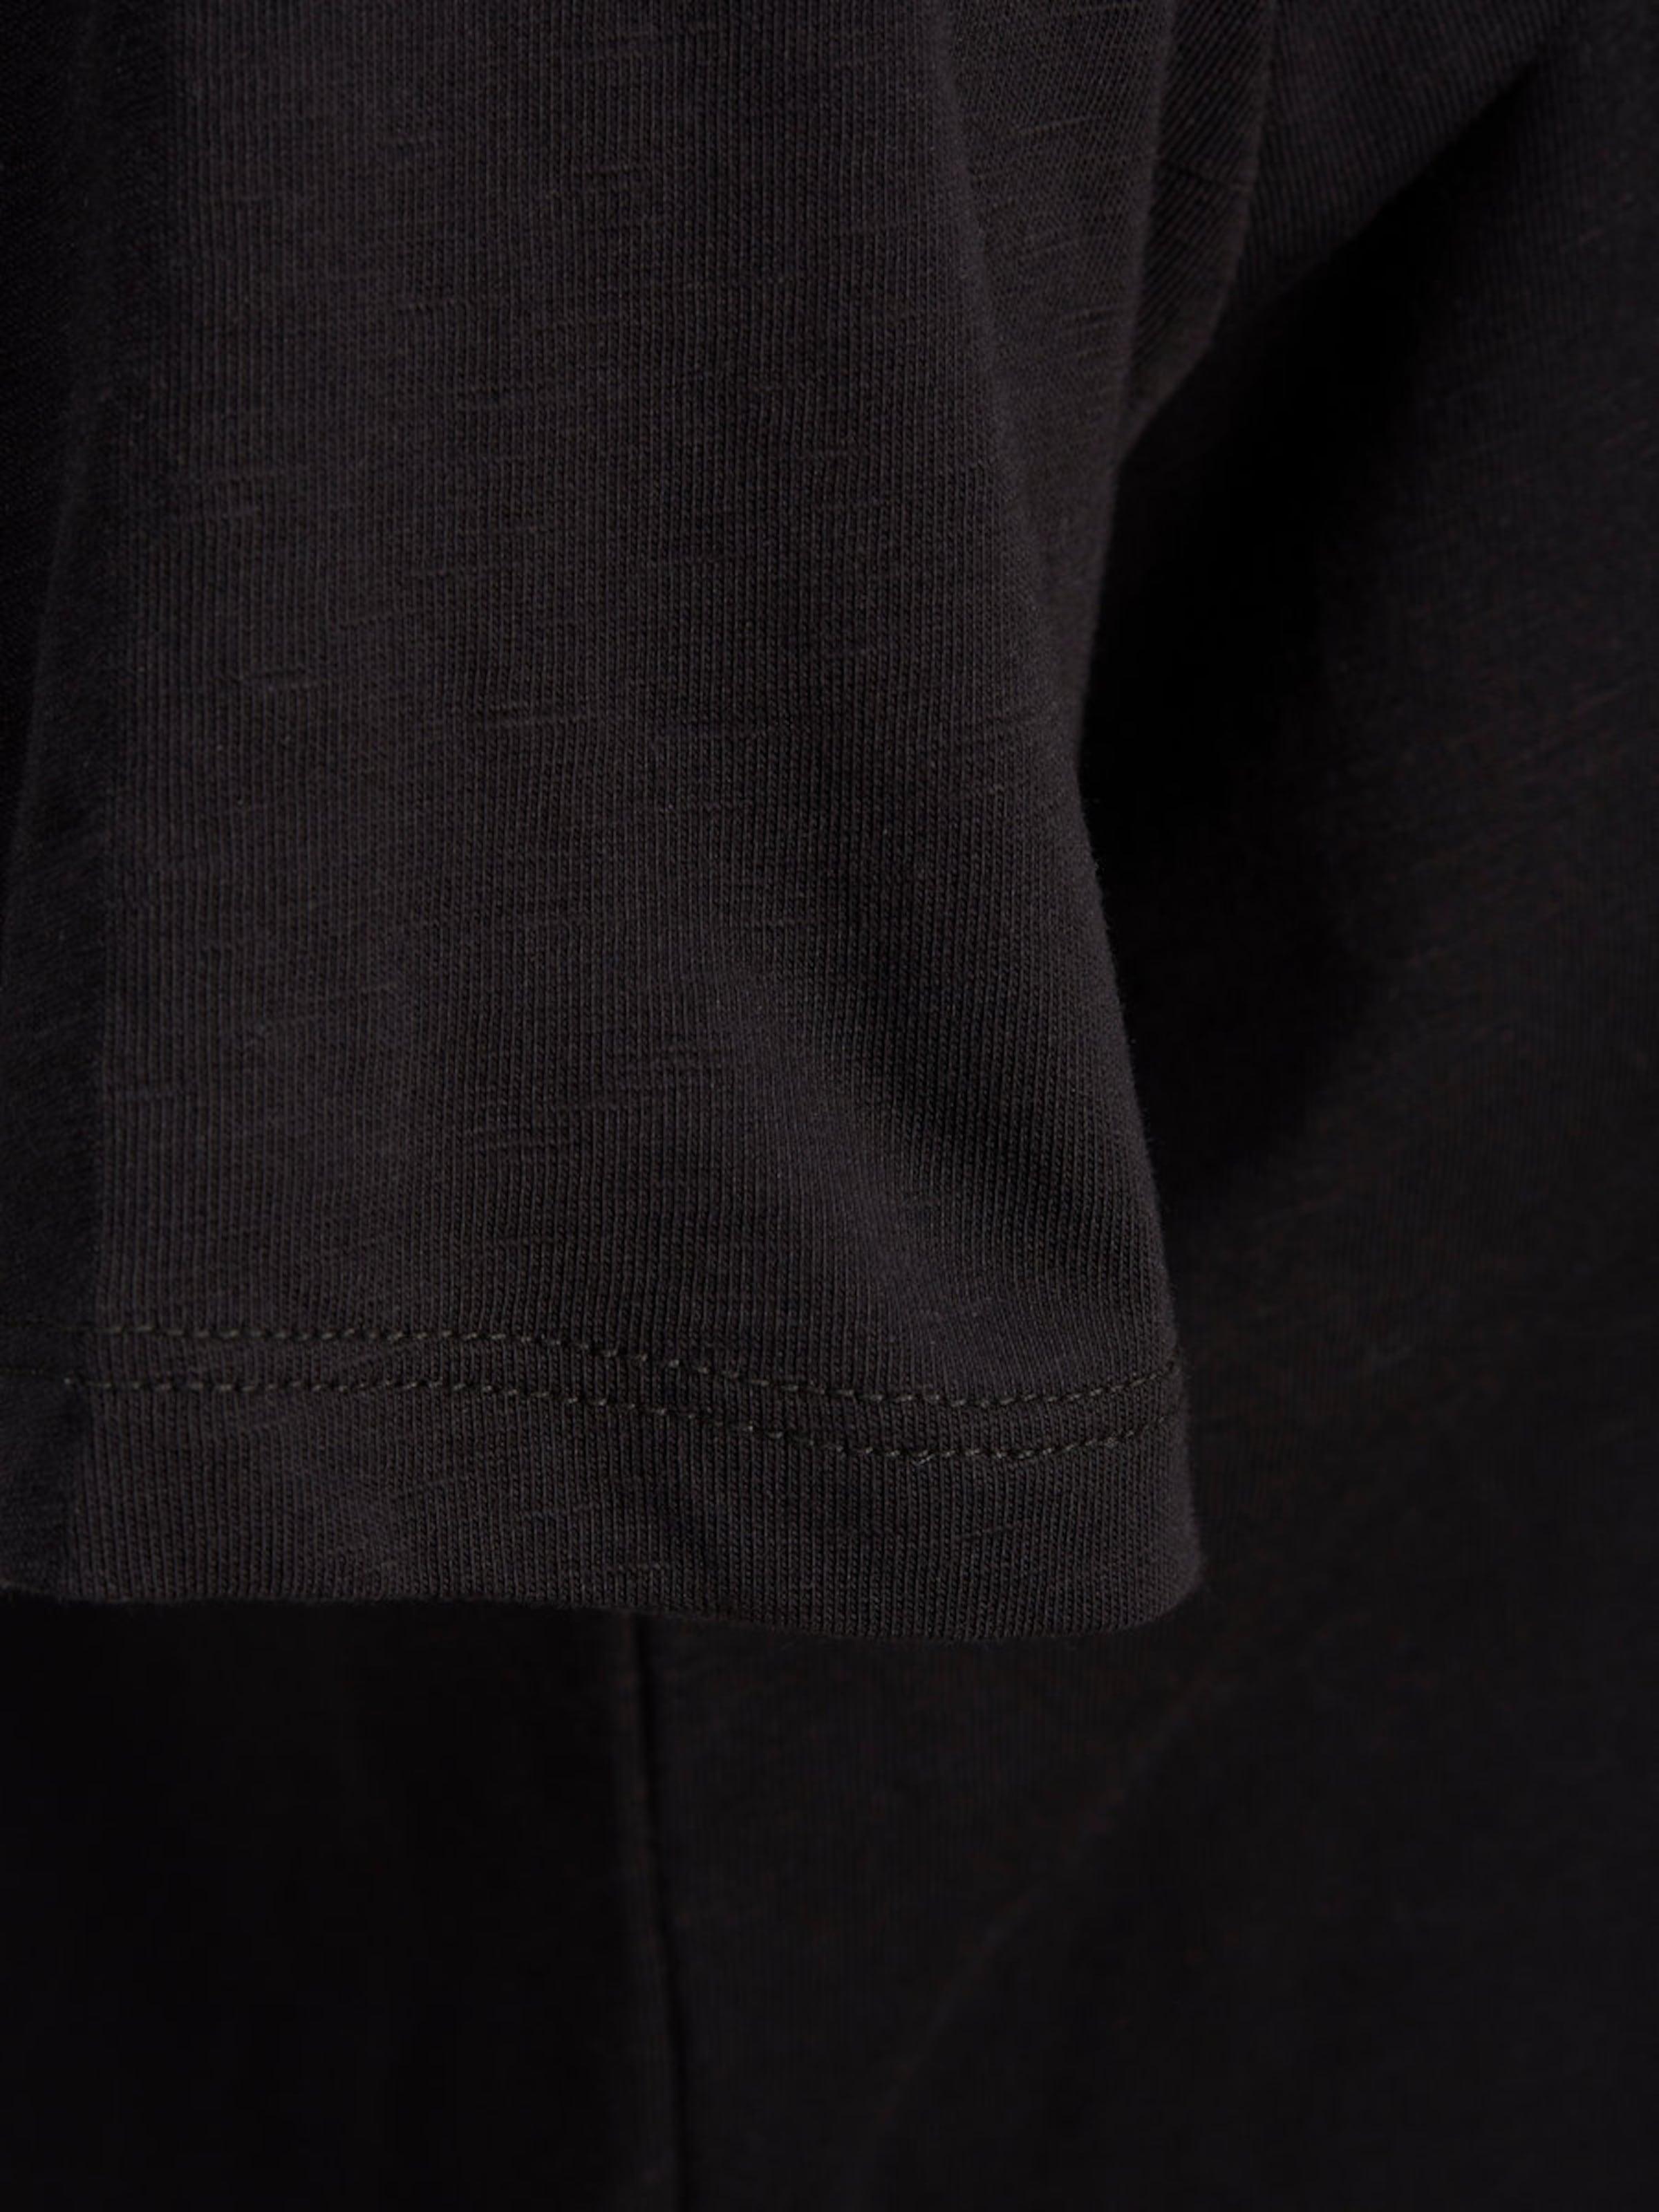 In Jackamp; shirt GrauSchwarz T Jones kXuPOZi